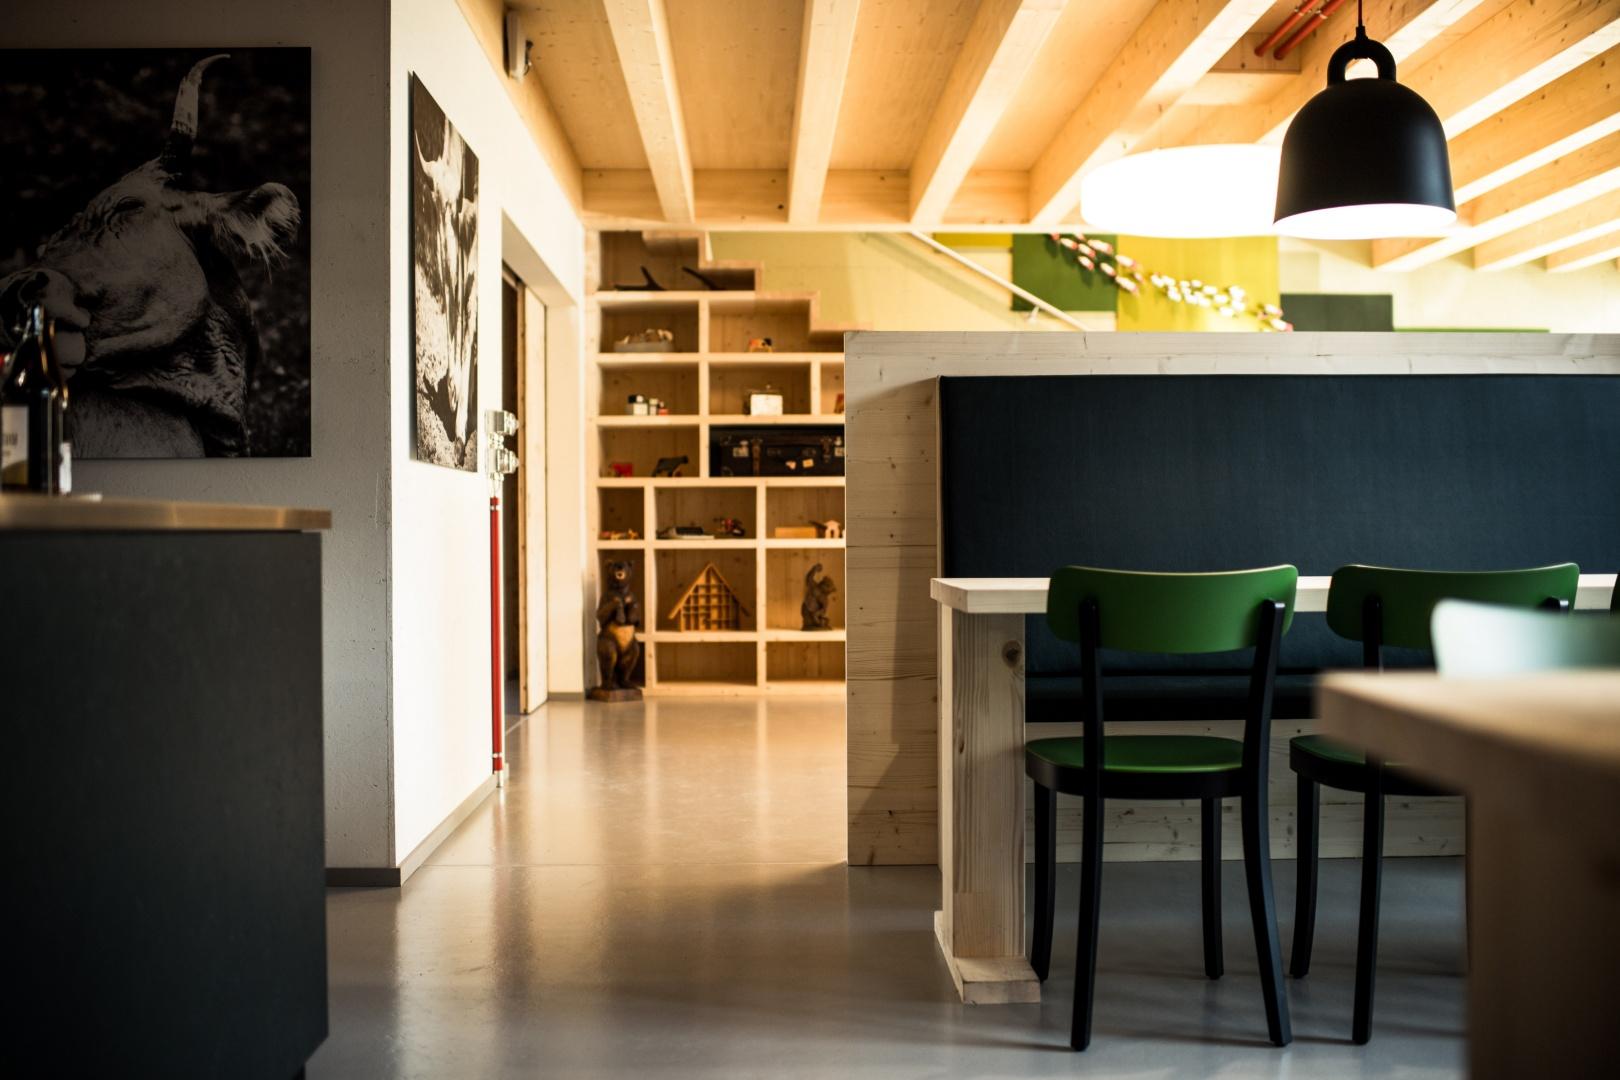 Caféteria © Adrian Bretscher